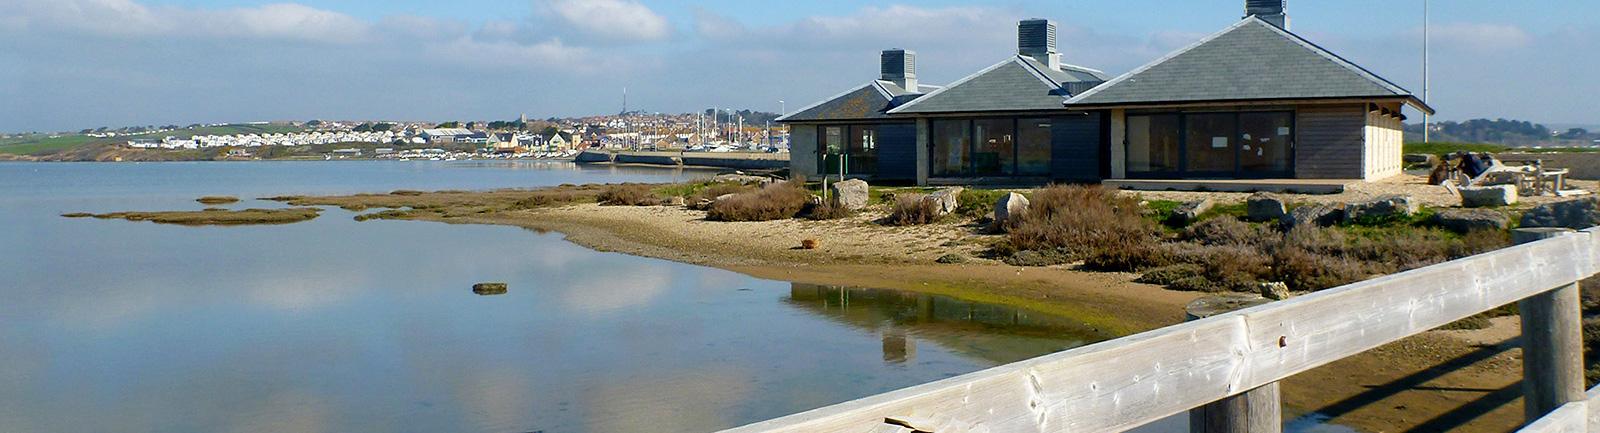 Chesil Beach Centre Redevelopment